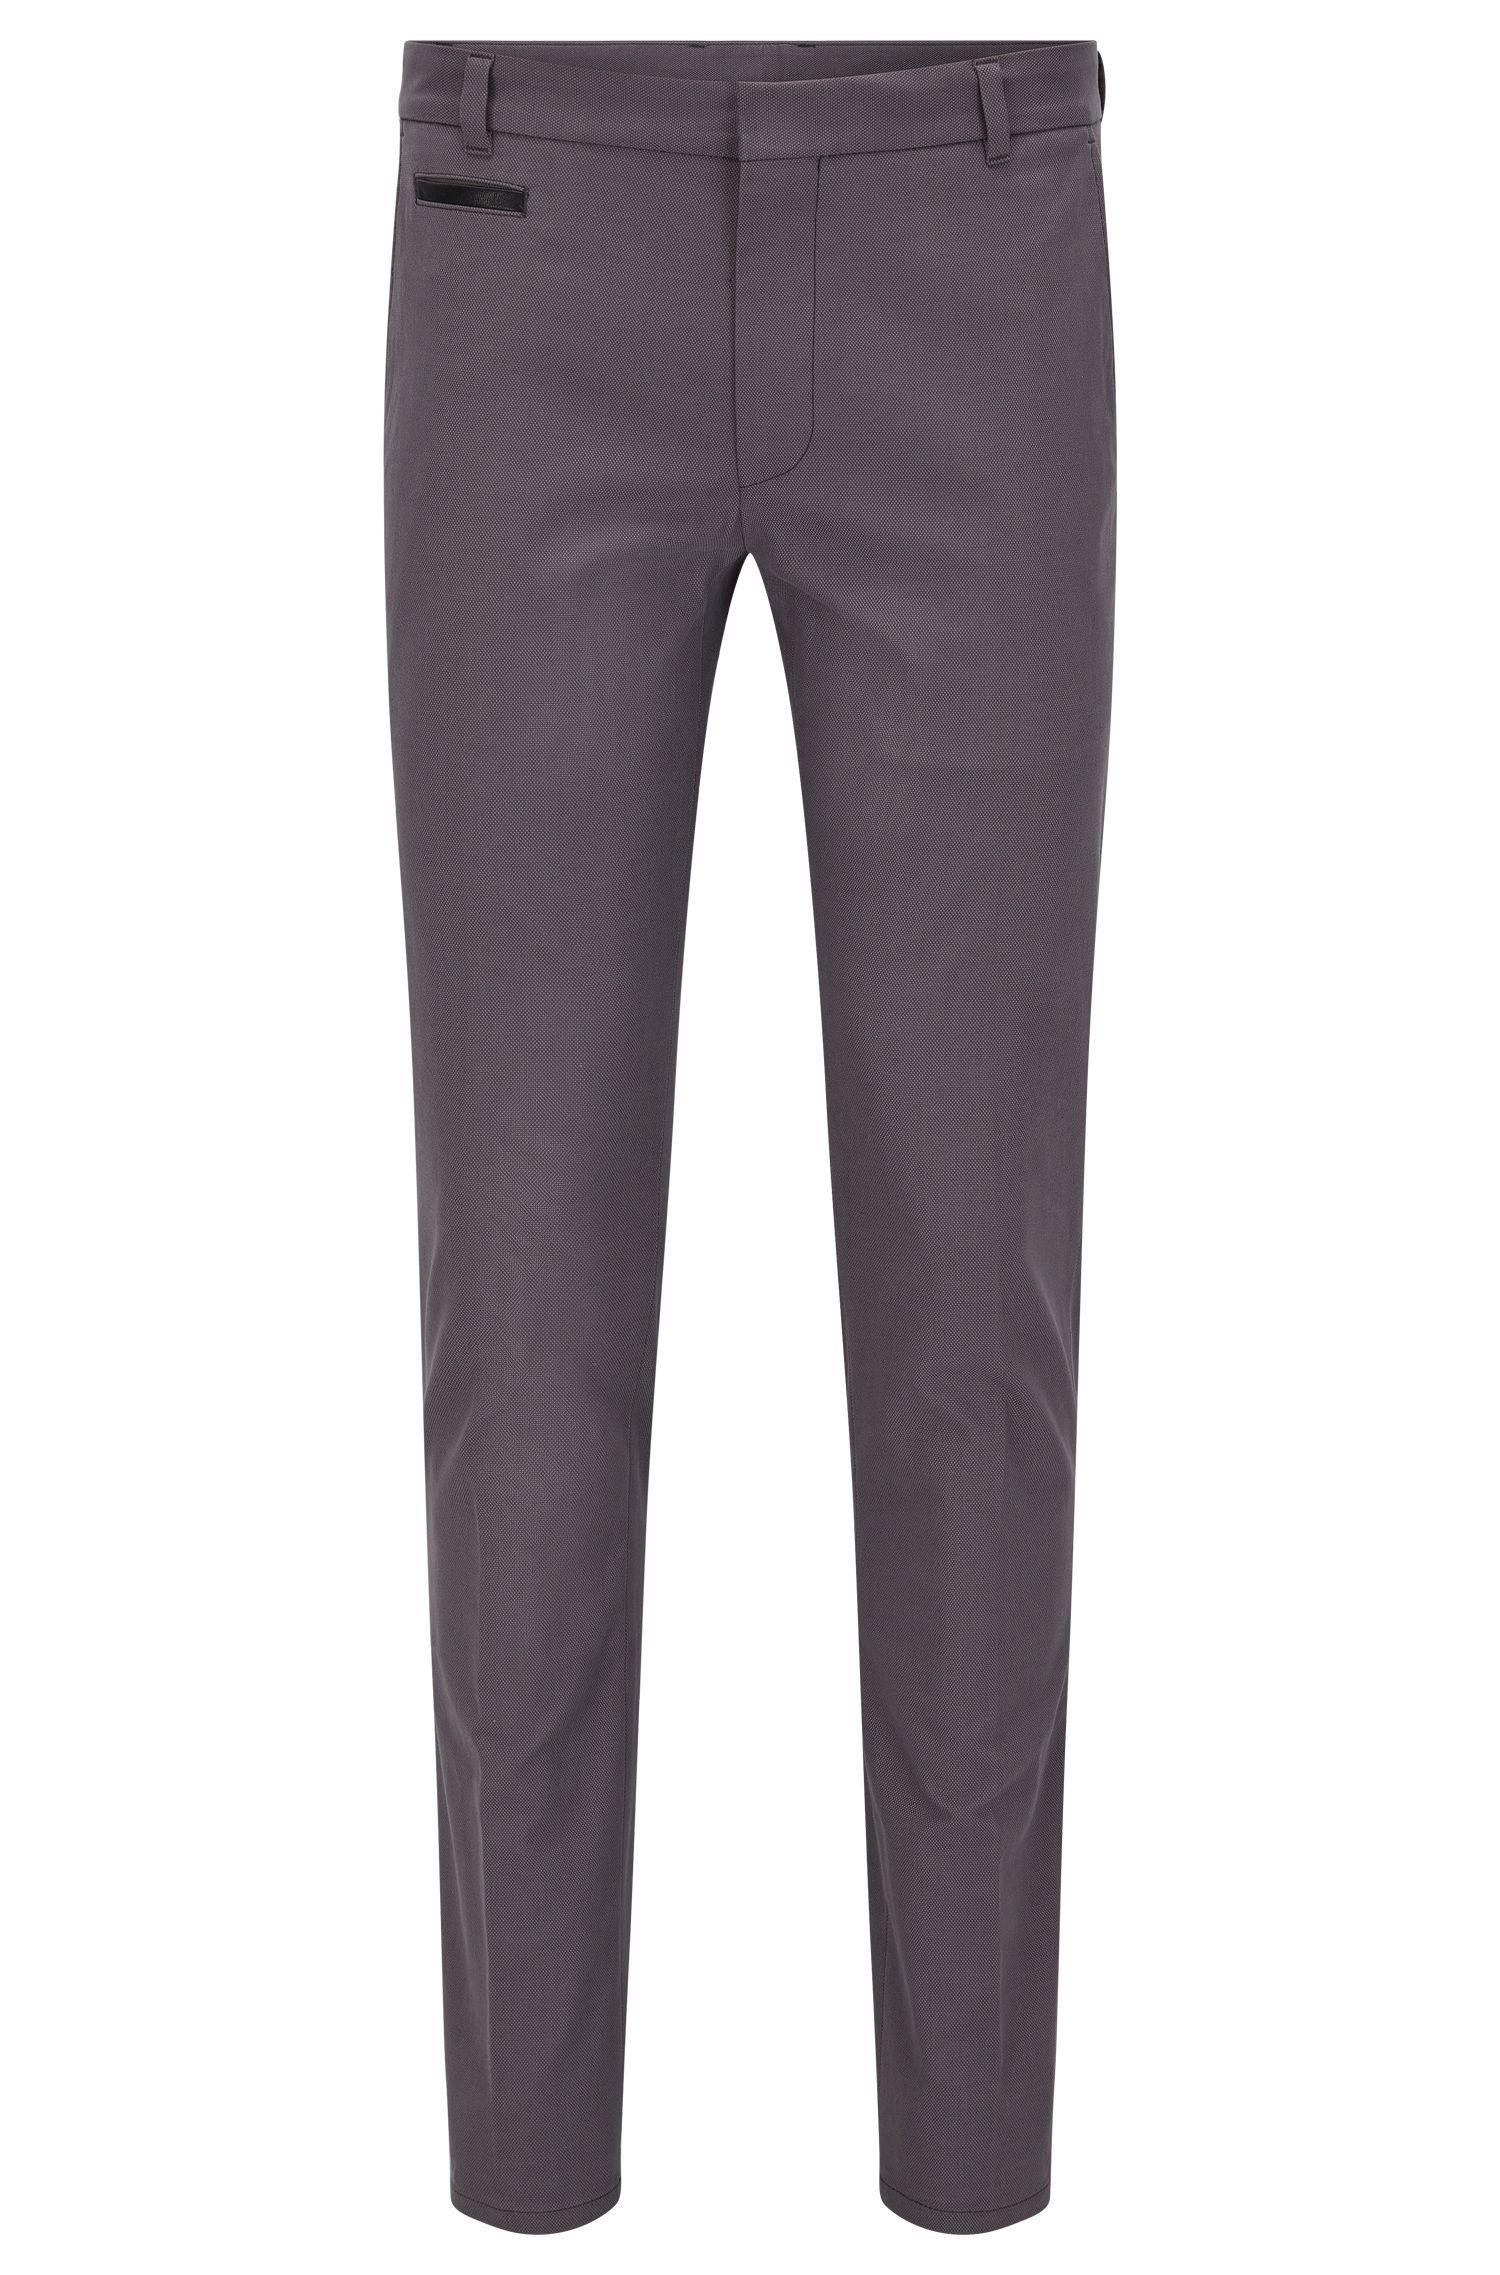 Pantalon Extra Slim Fit en tissu bicolore